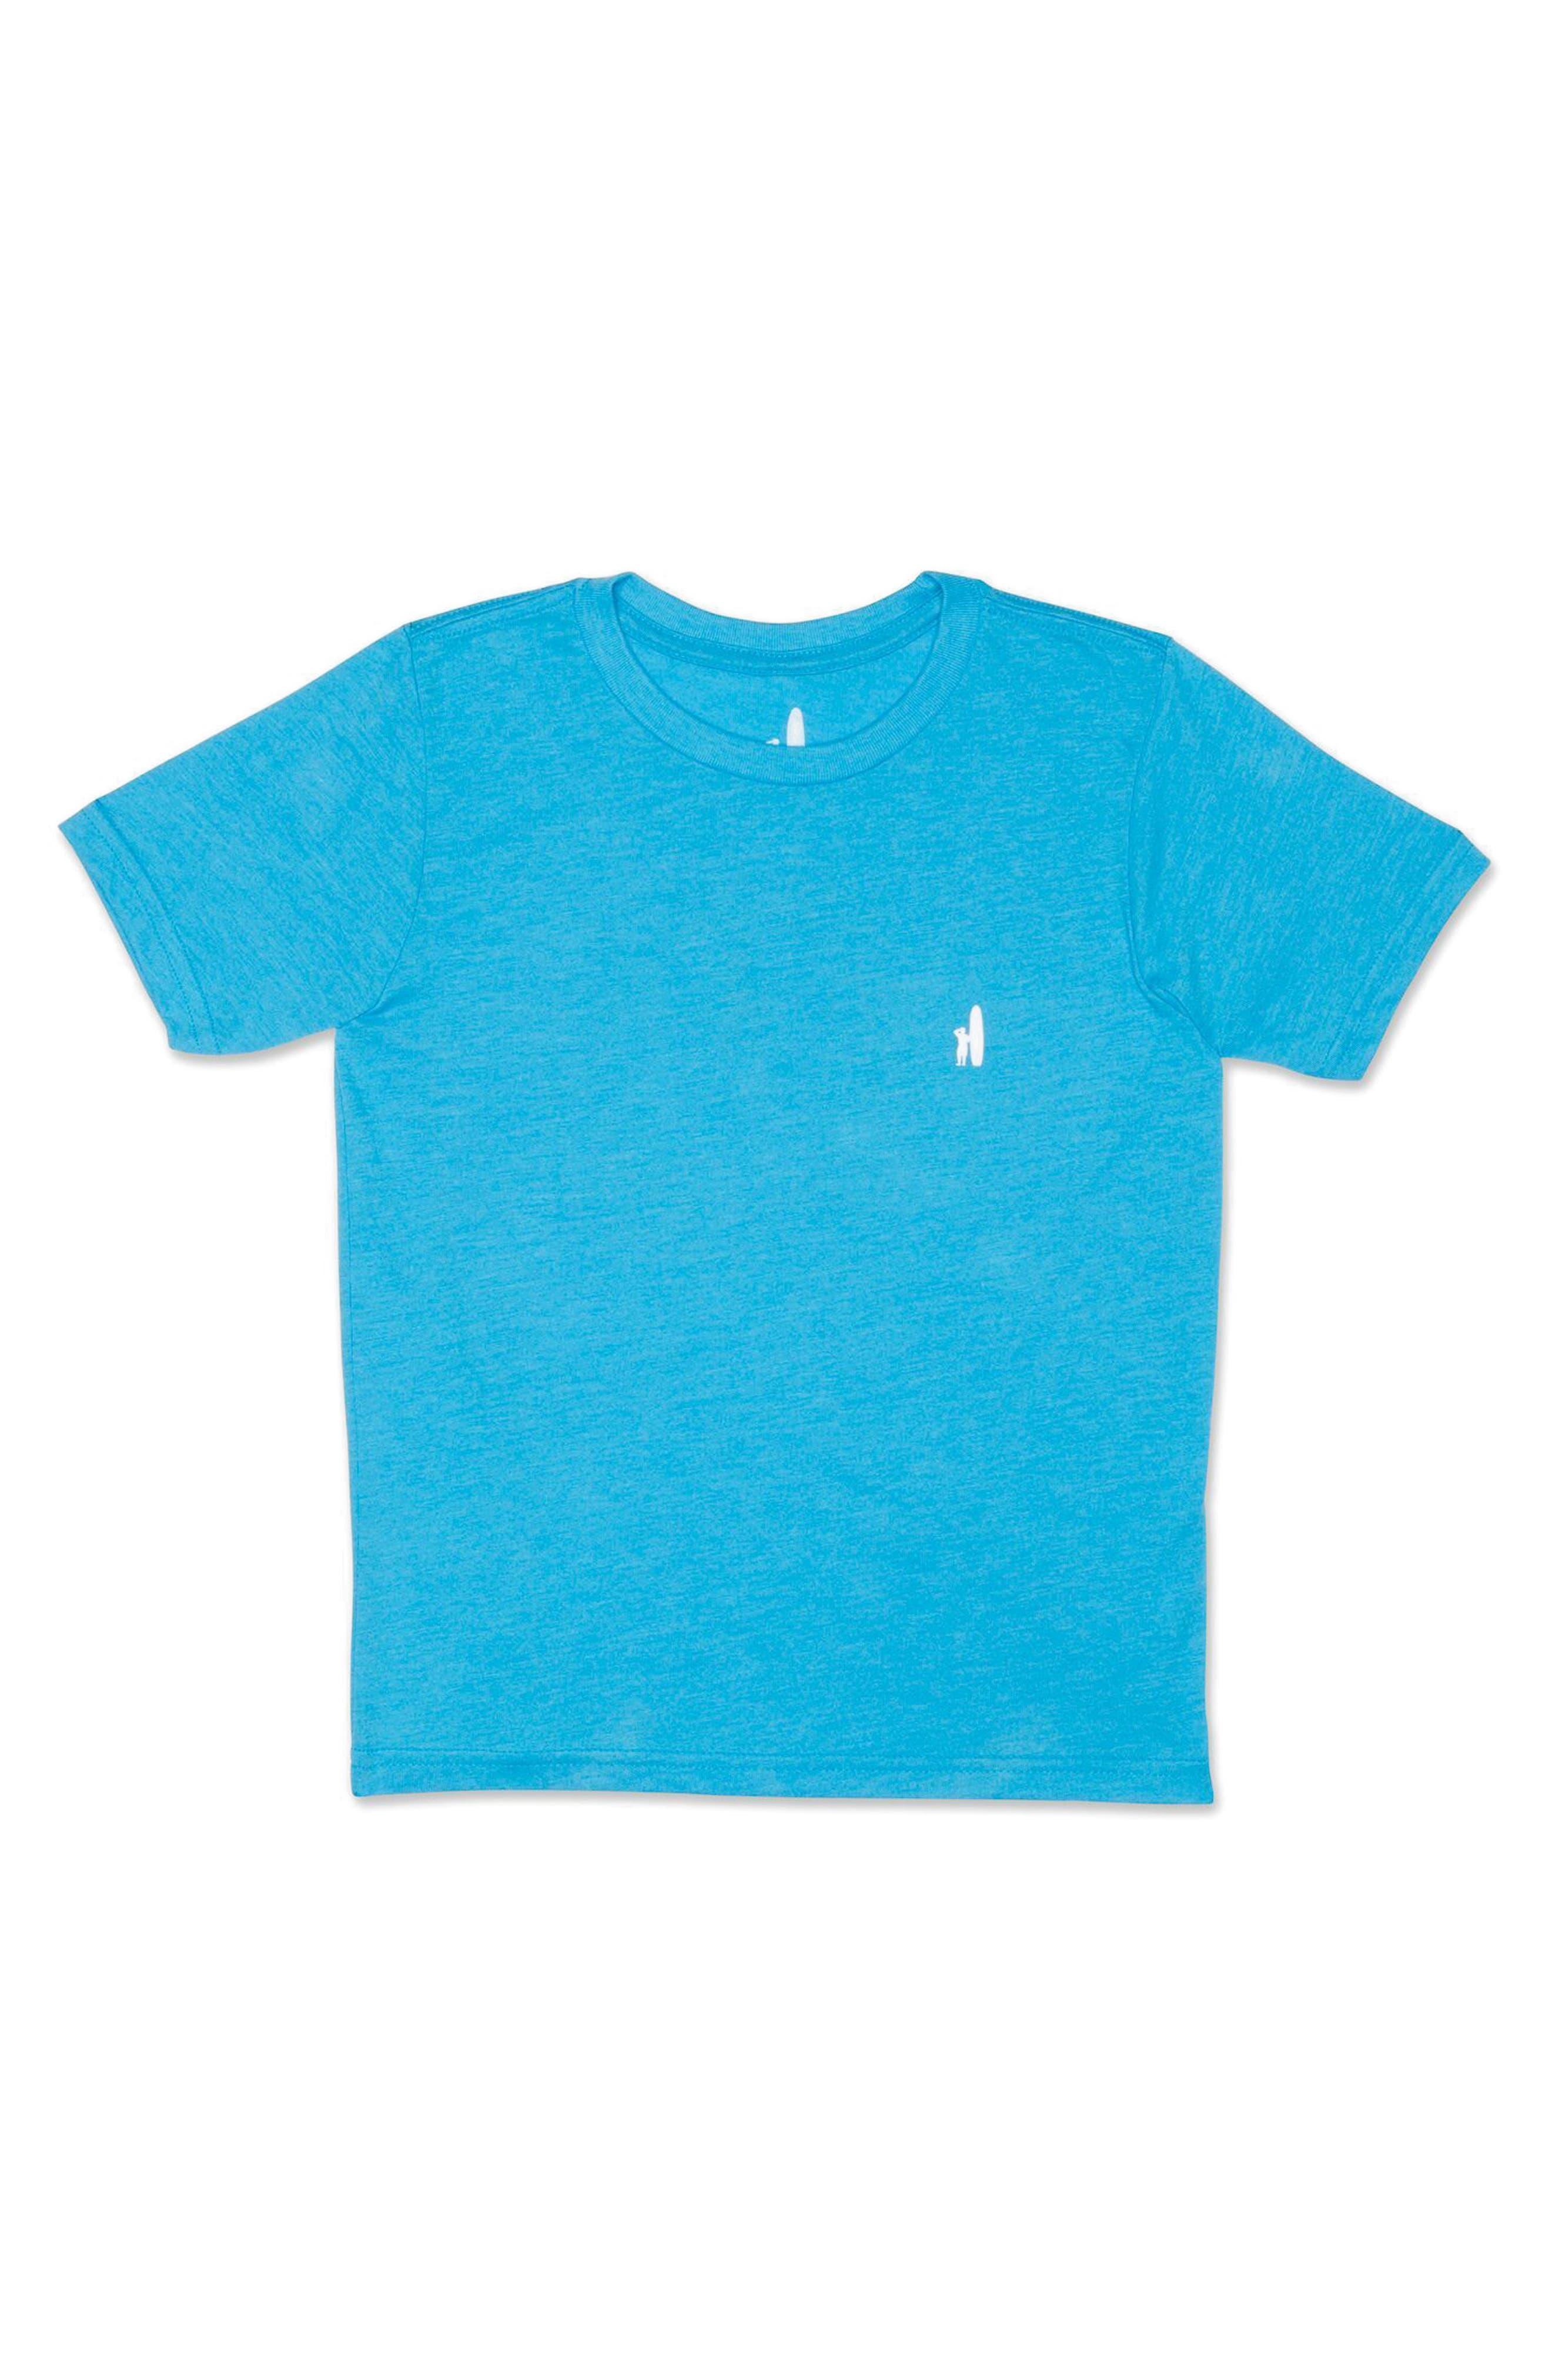 Vance T-Shirt,                         Main,                         color, Cayman